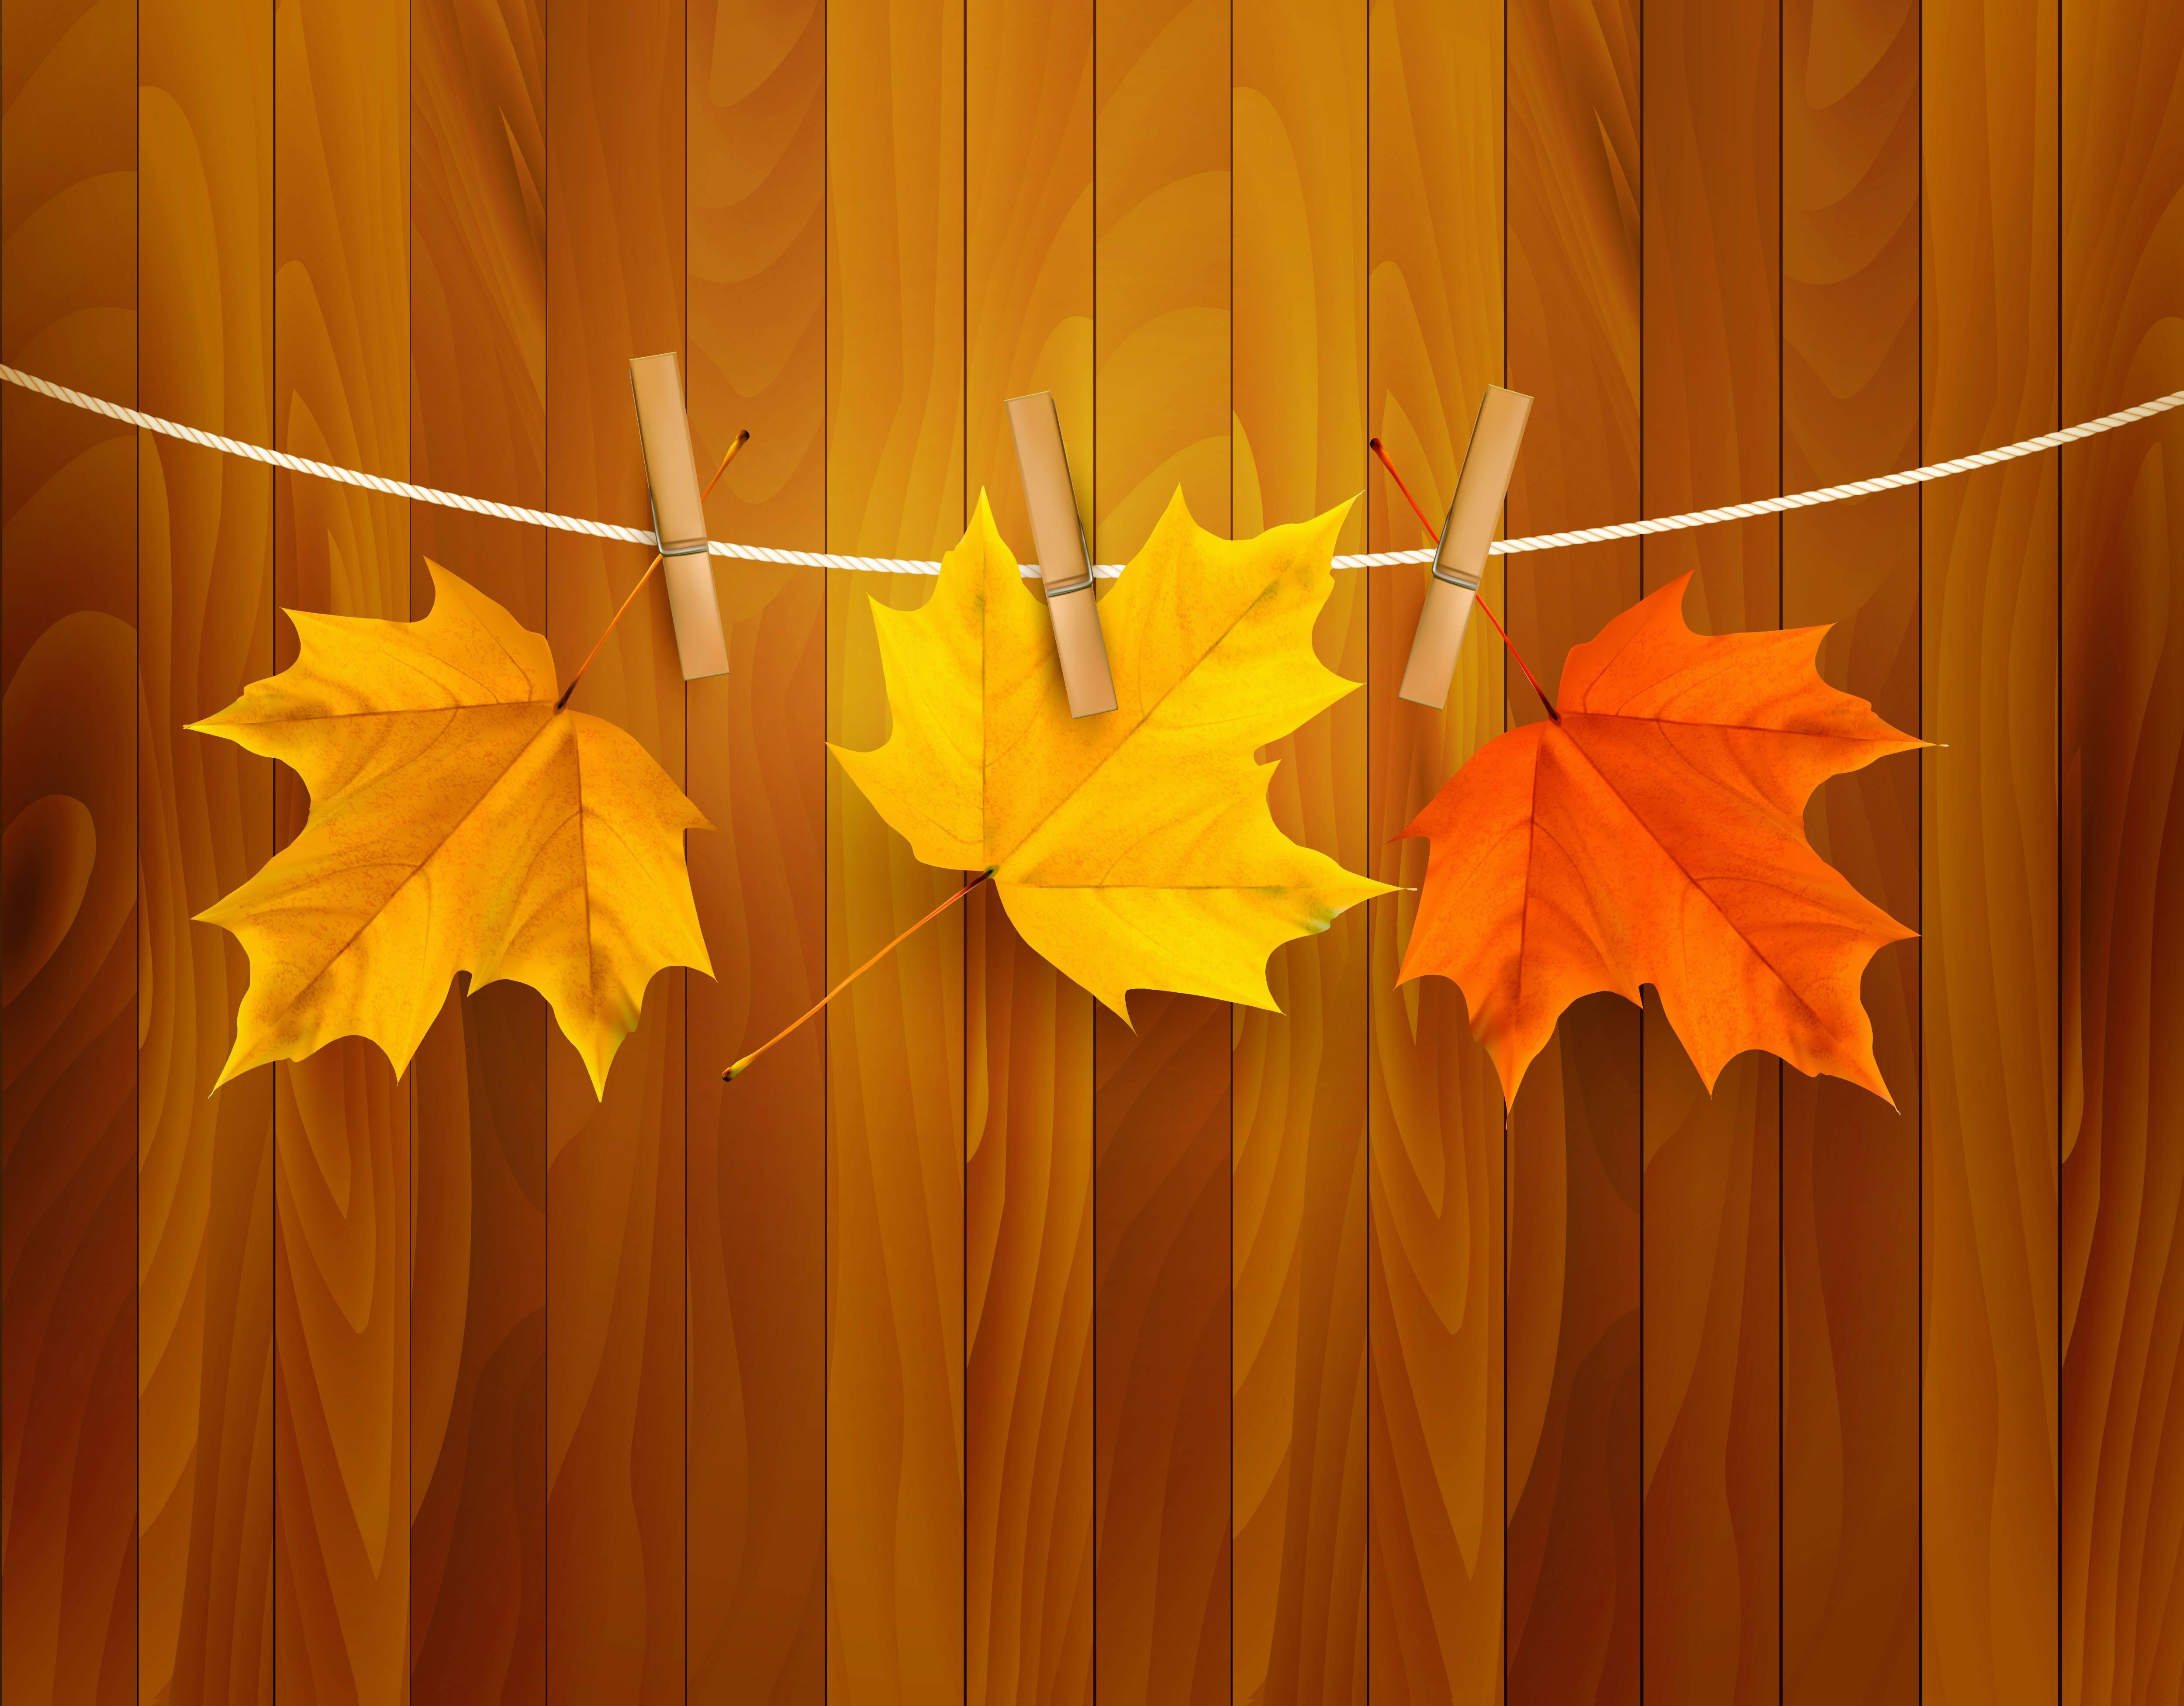 Fun Fall Desktop Wallpaper Fall Leaves Backgrounds Wallpaper Cave